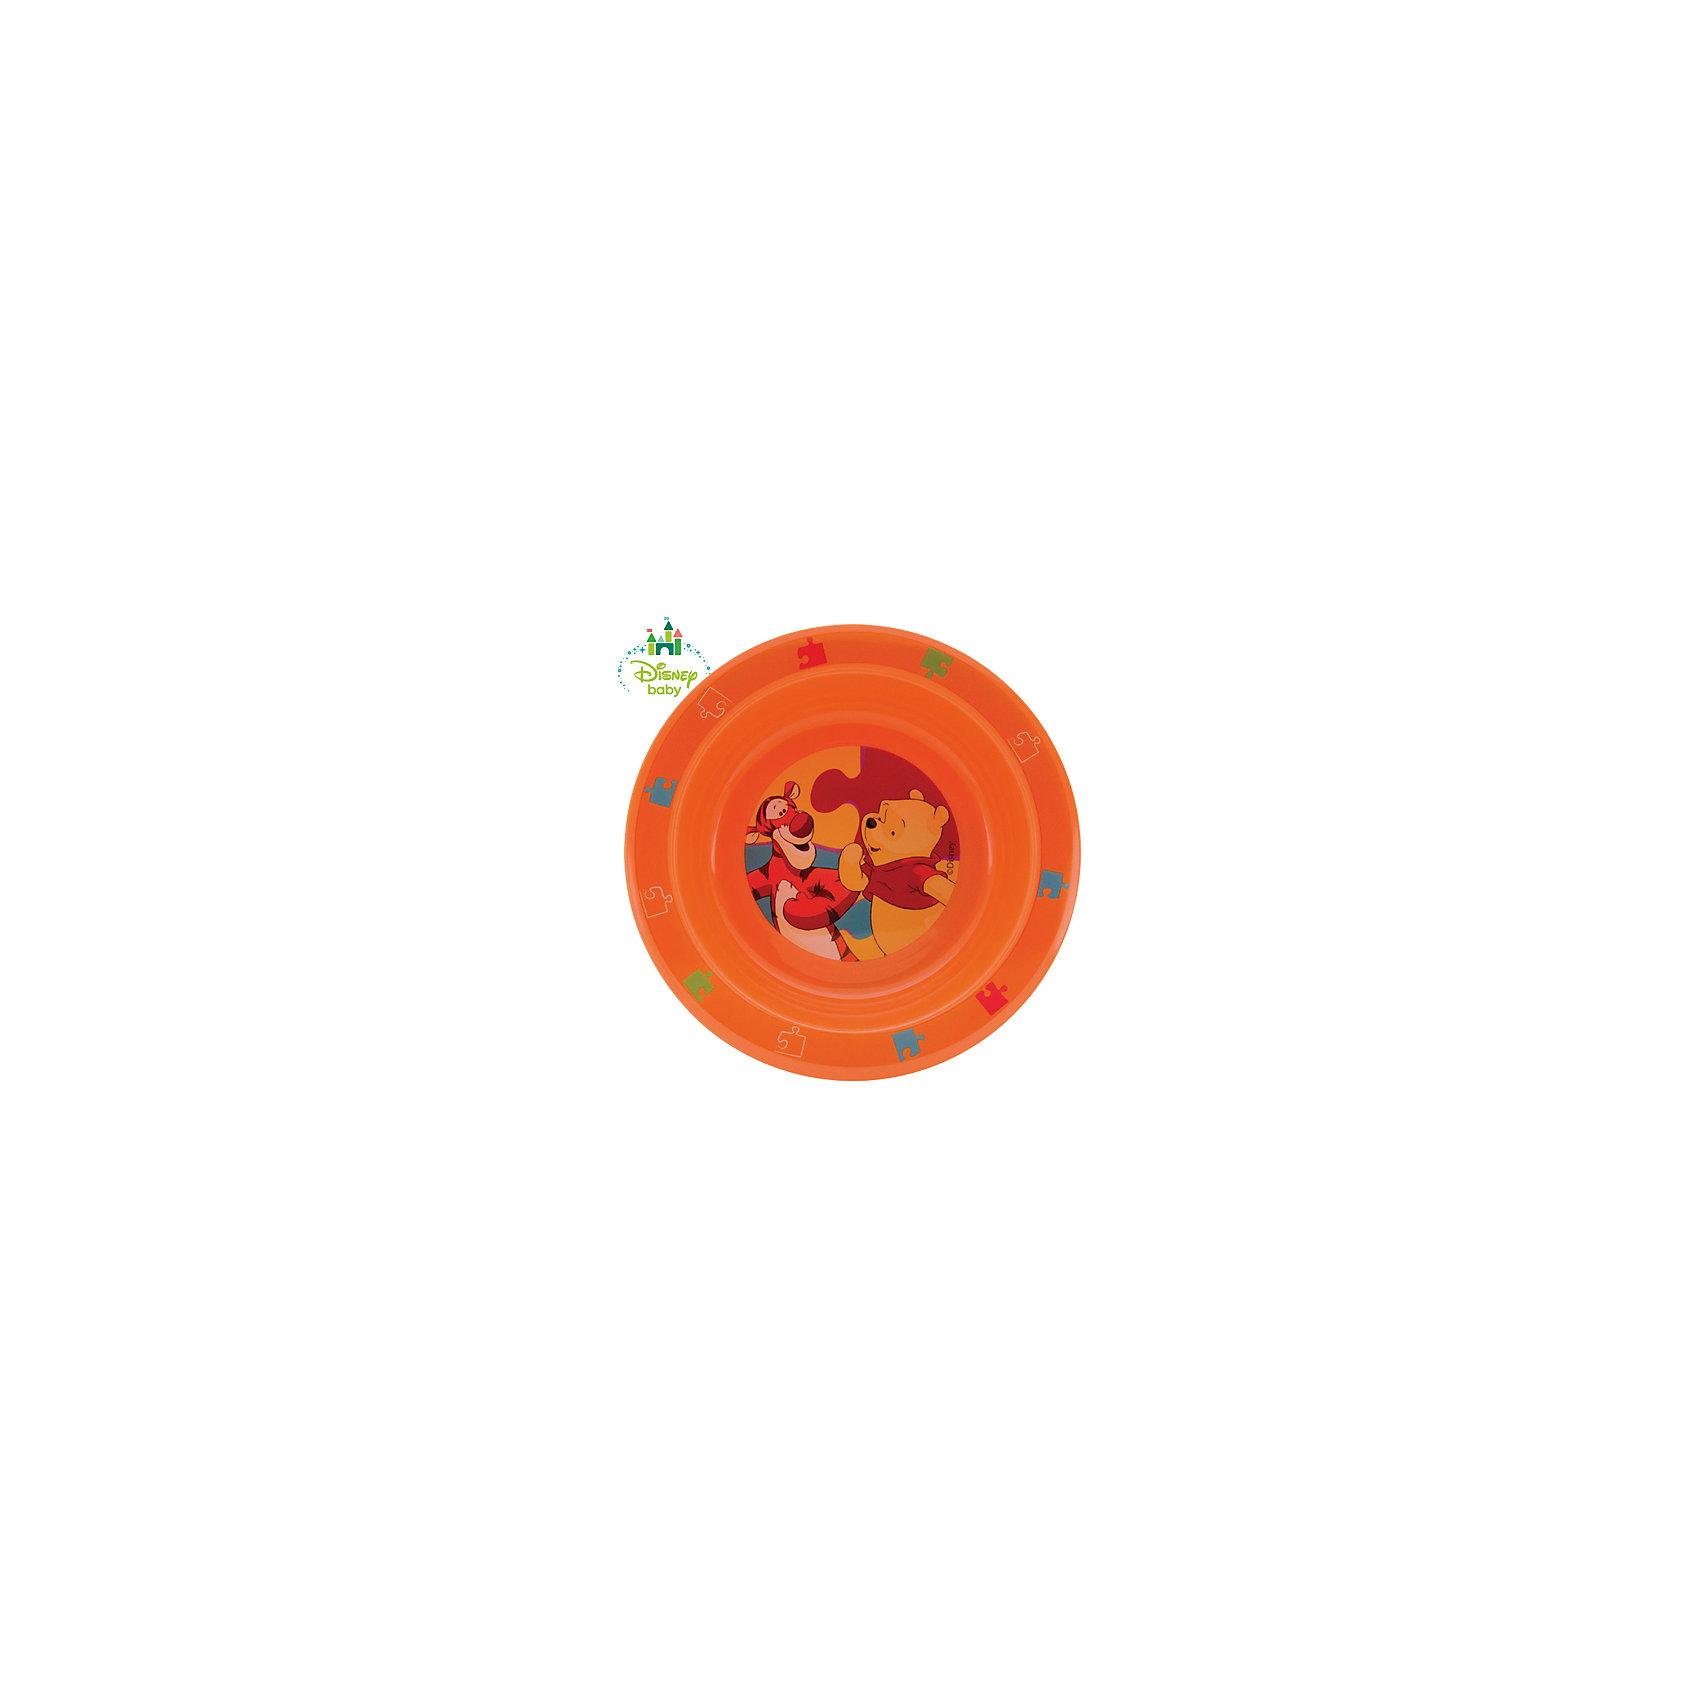 Тарелка Медвежонок Винни DISNEY от 6 мес., LUBBY, оранжевый